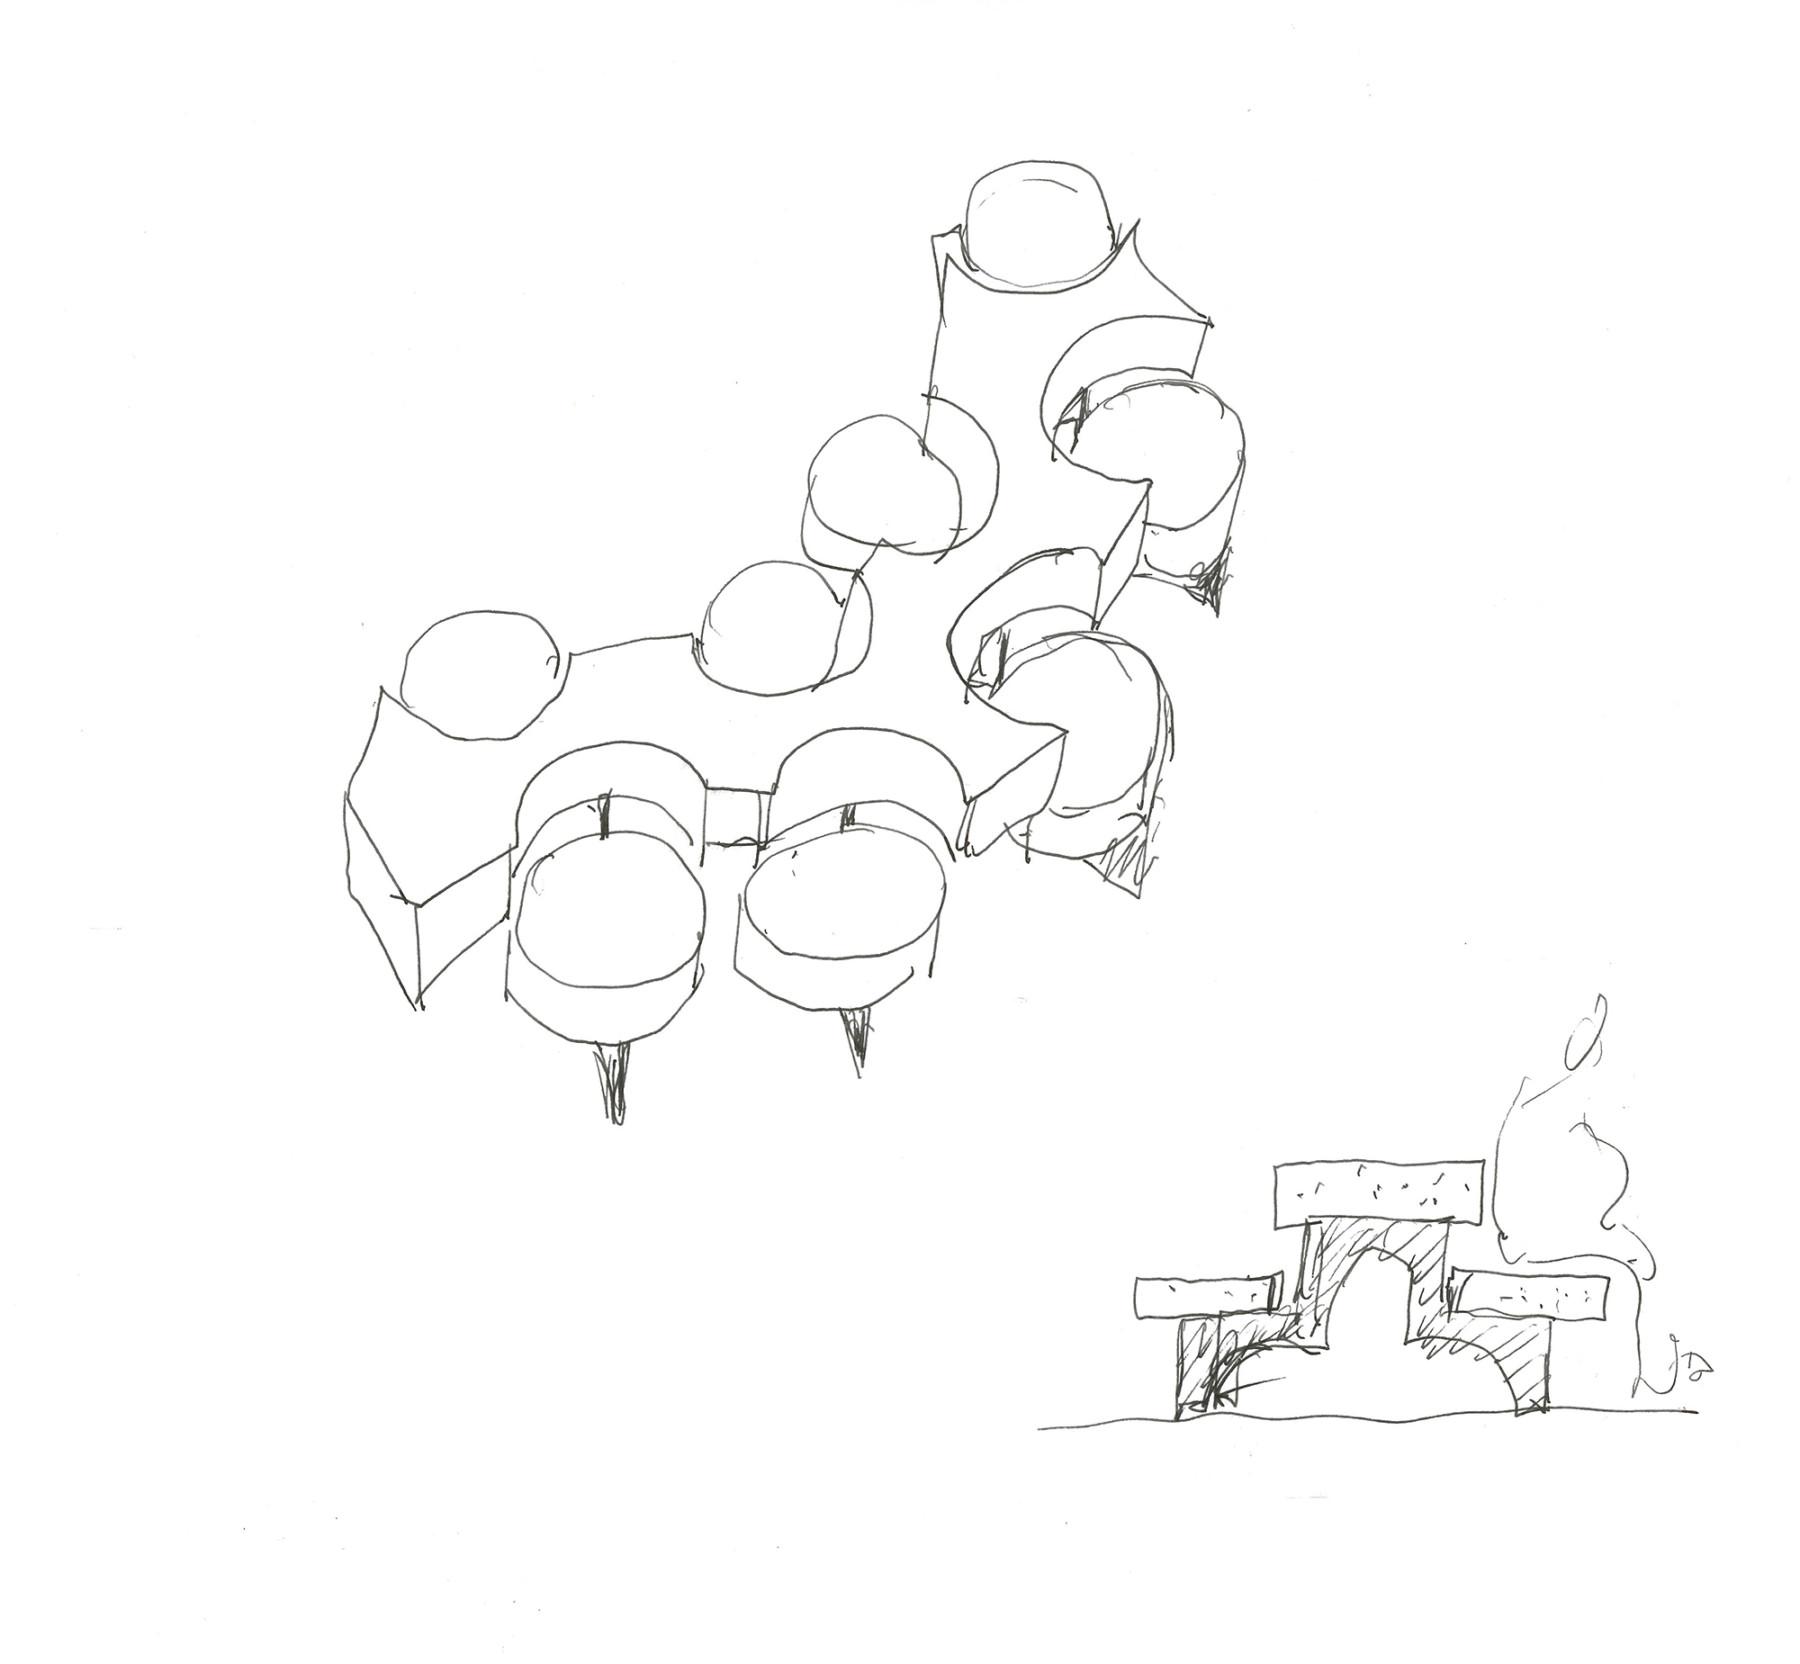 jamie-fobert-architects-selfridges-shoe-galleries-luxury-retail-concept-gallery-5-sketch2